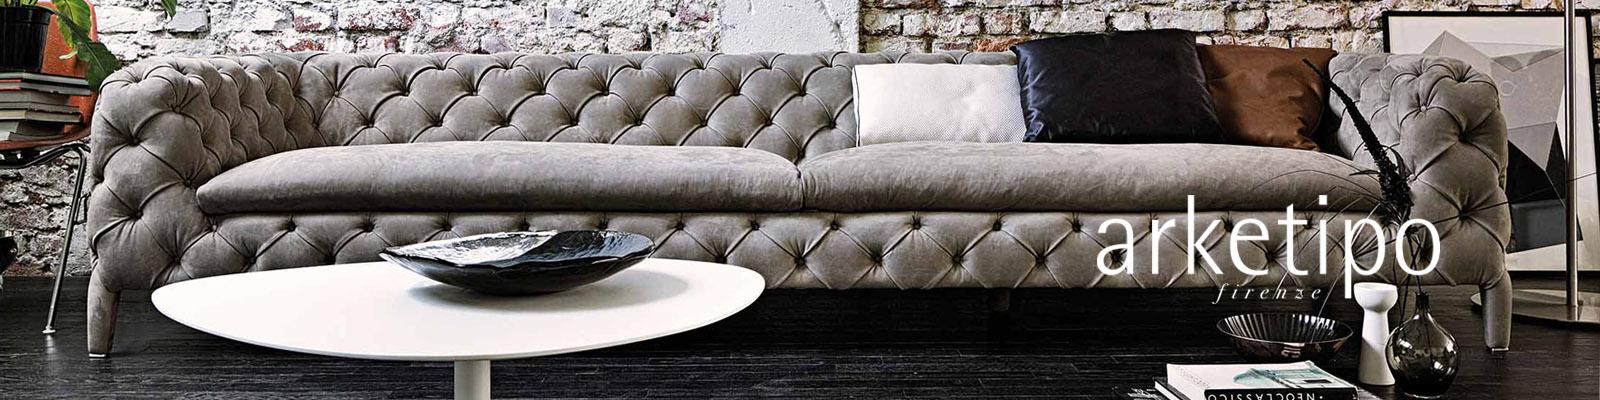 divano-windsor--arketipo-sofa-armchair-pelle- leather-velluto-velvet ...